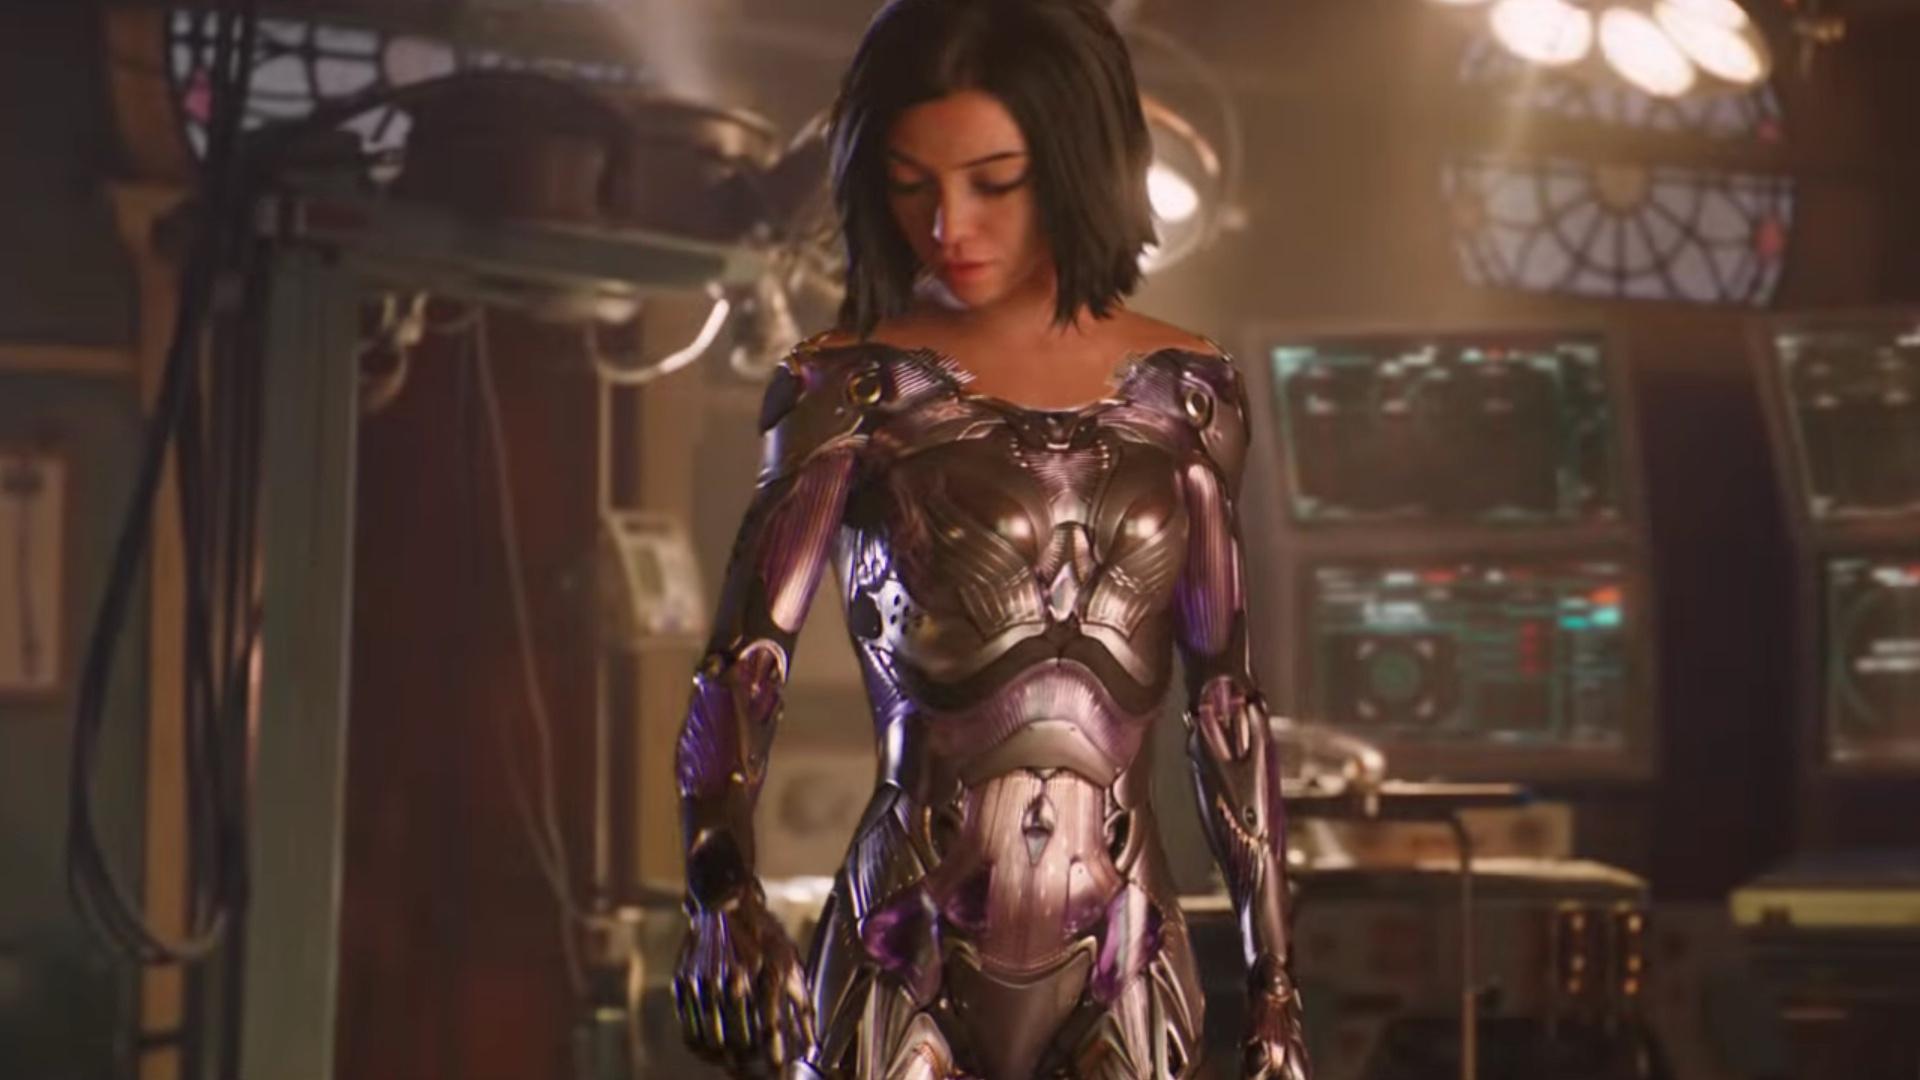 Alita Battle Angel 2 Will there be a Sequel-New Berserker Body